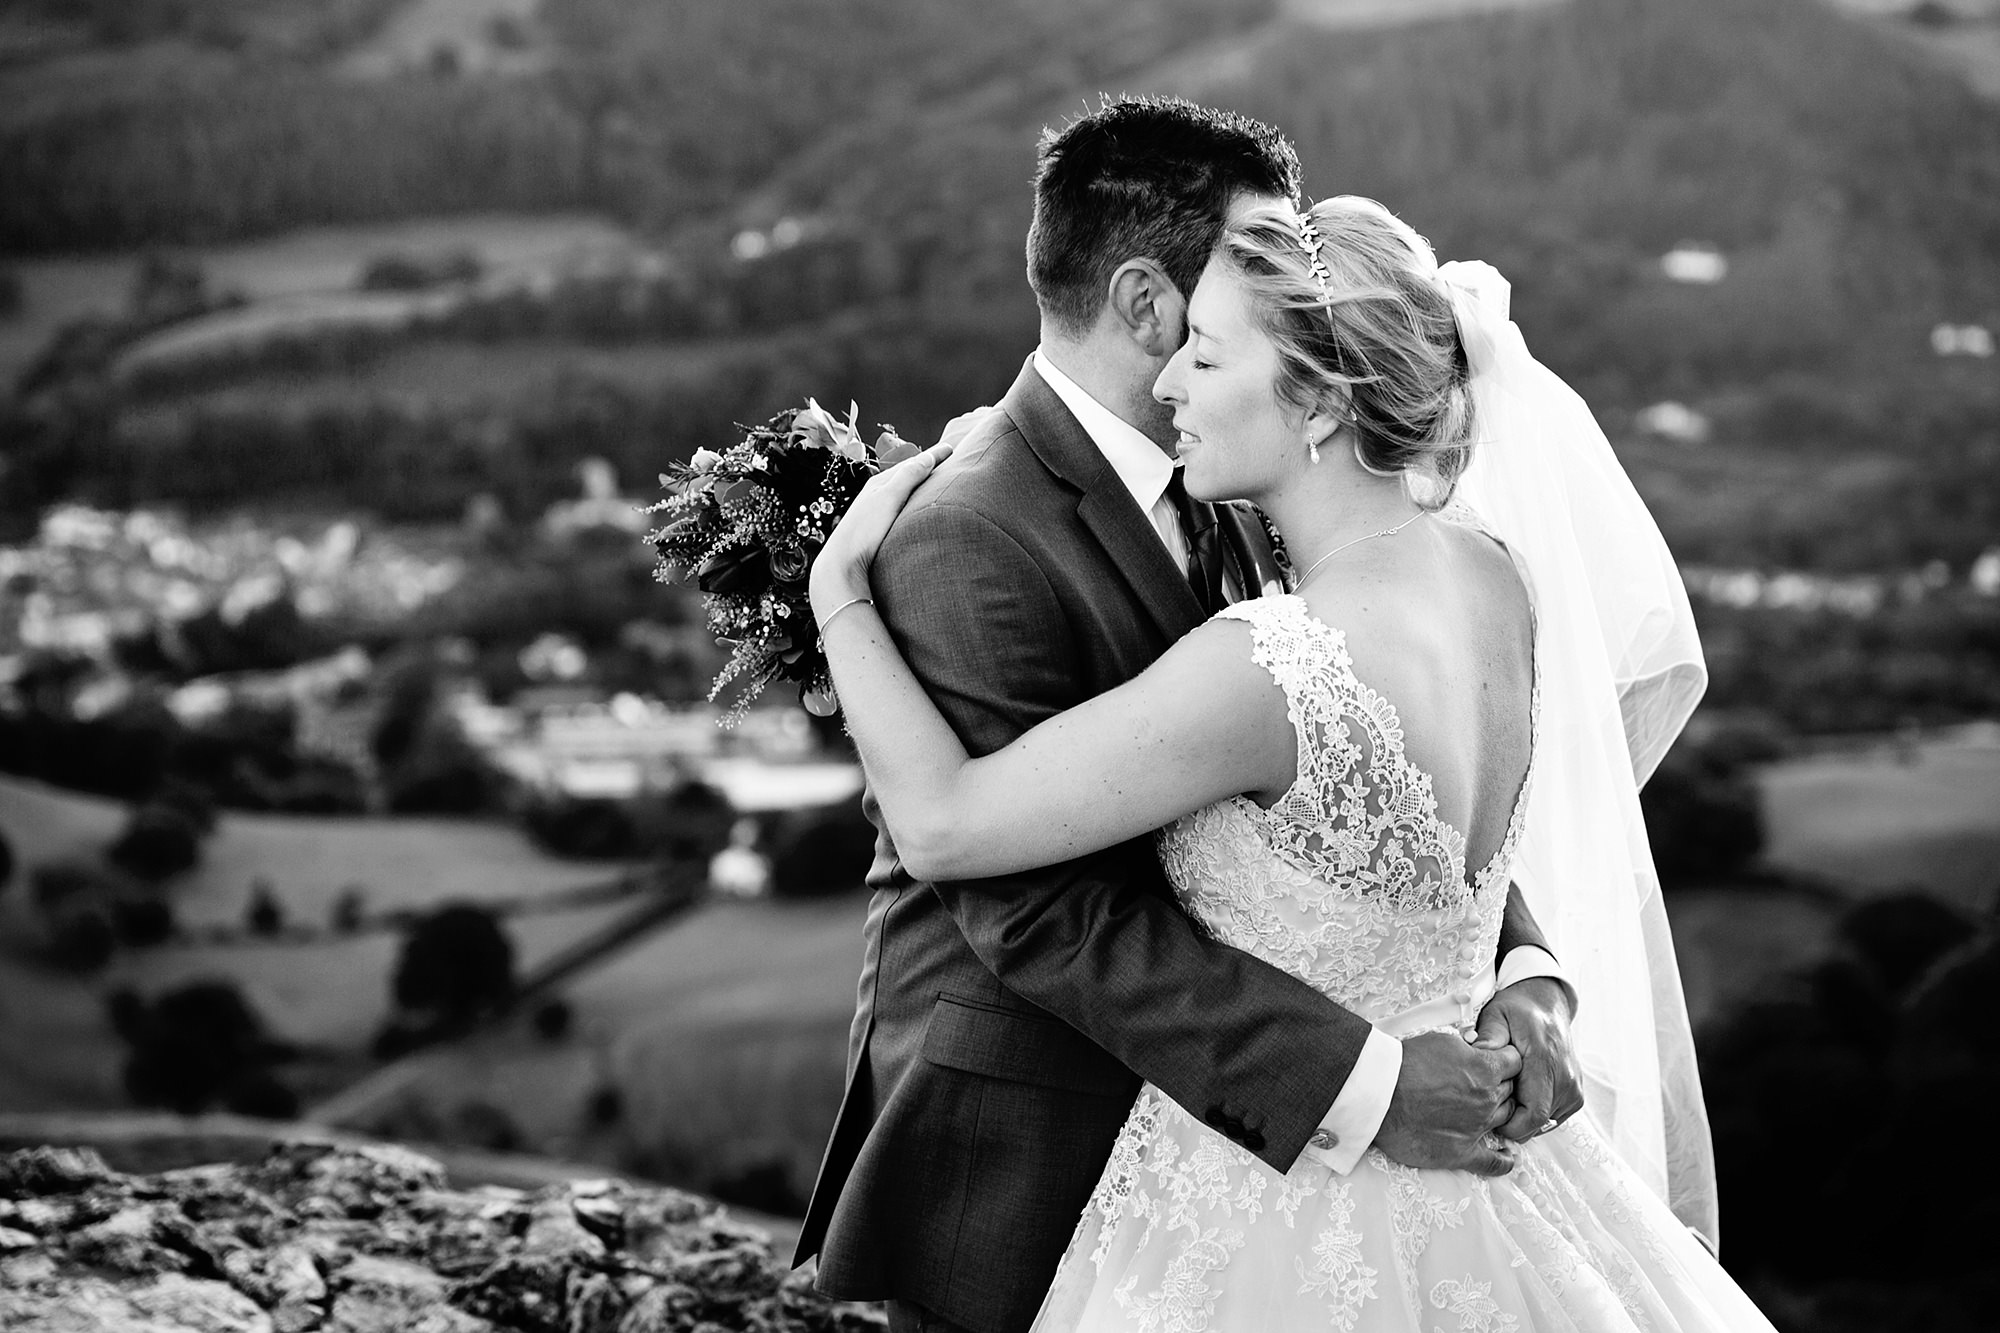 Castell dinas bran wedding photography portrait of bride and groom hugging